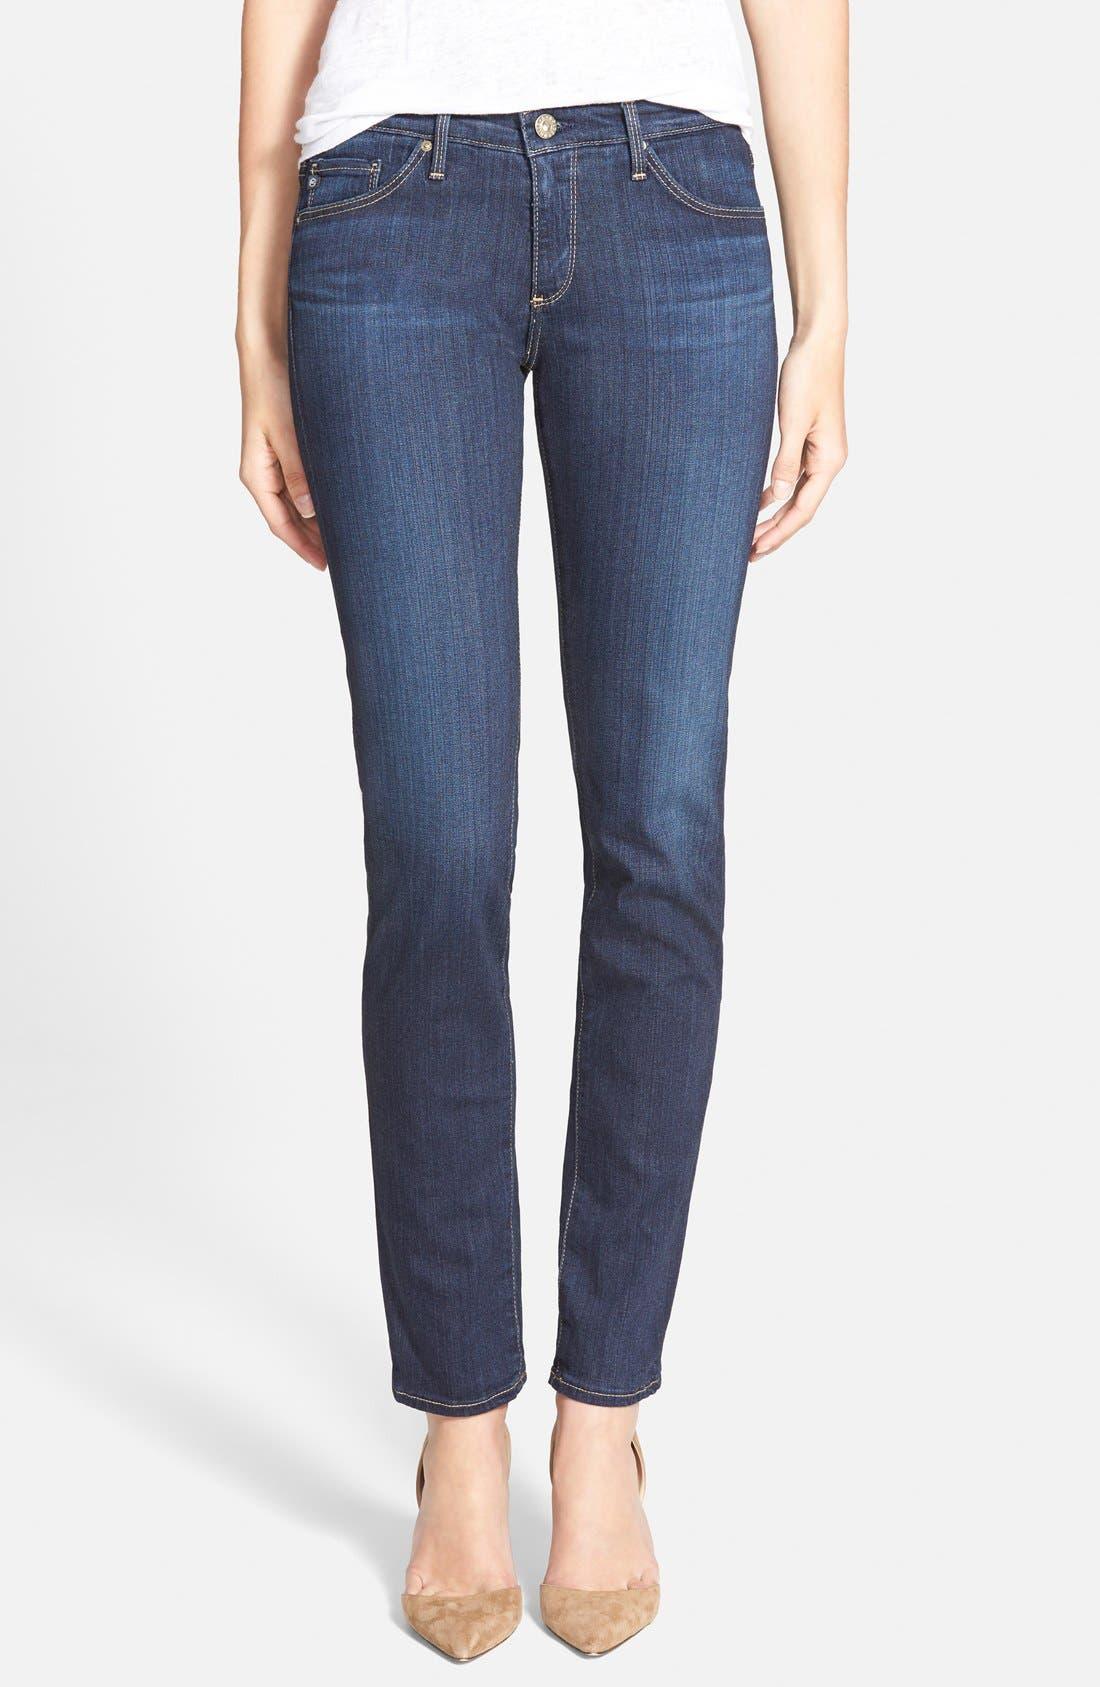 'The Stilt' Cigarette Skinny Jeans,                             Main thumbnail 6, color,